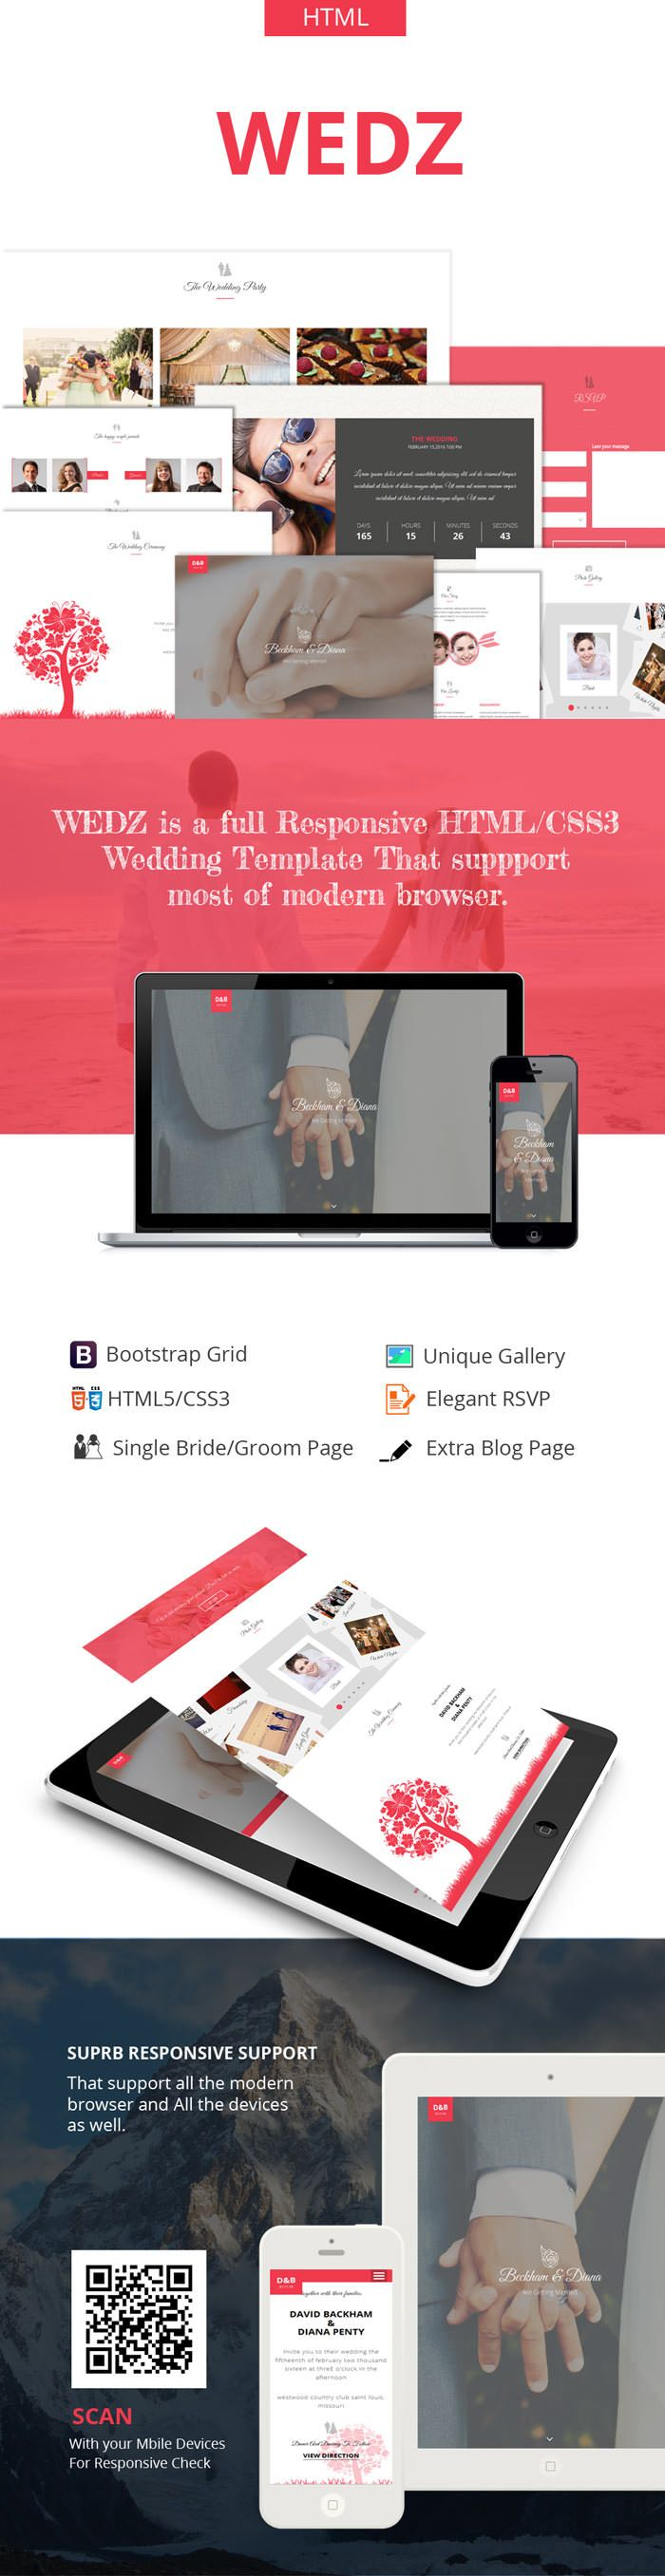 Wedz - Responsive HTML5 Wedding Template - 1